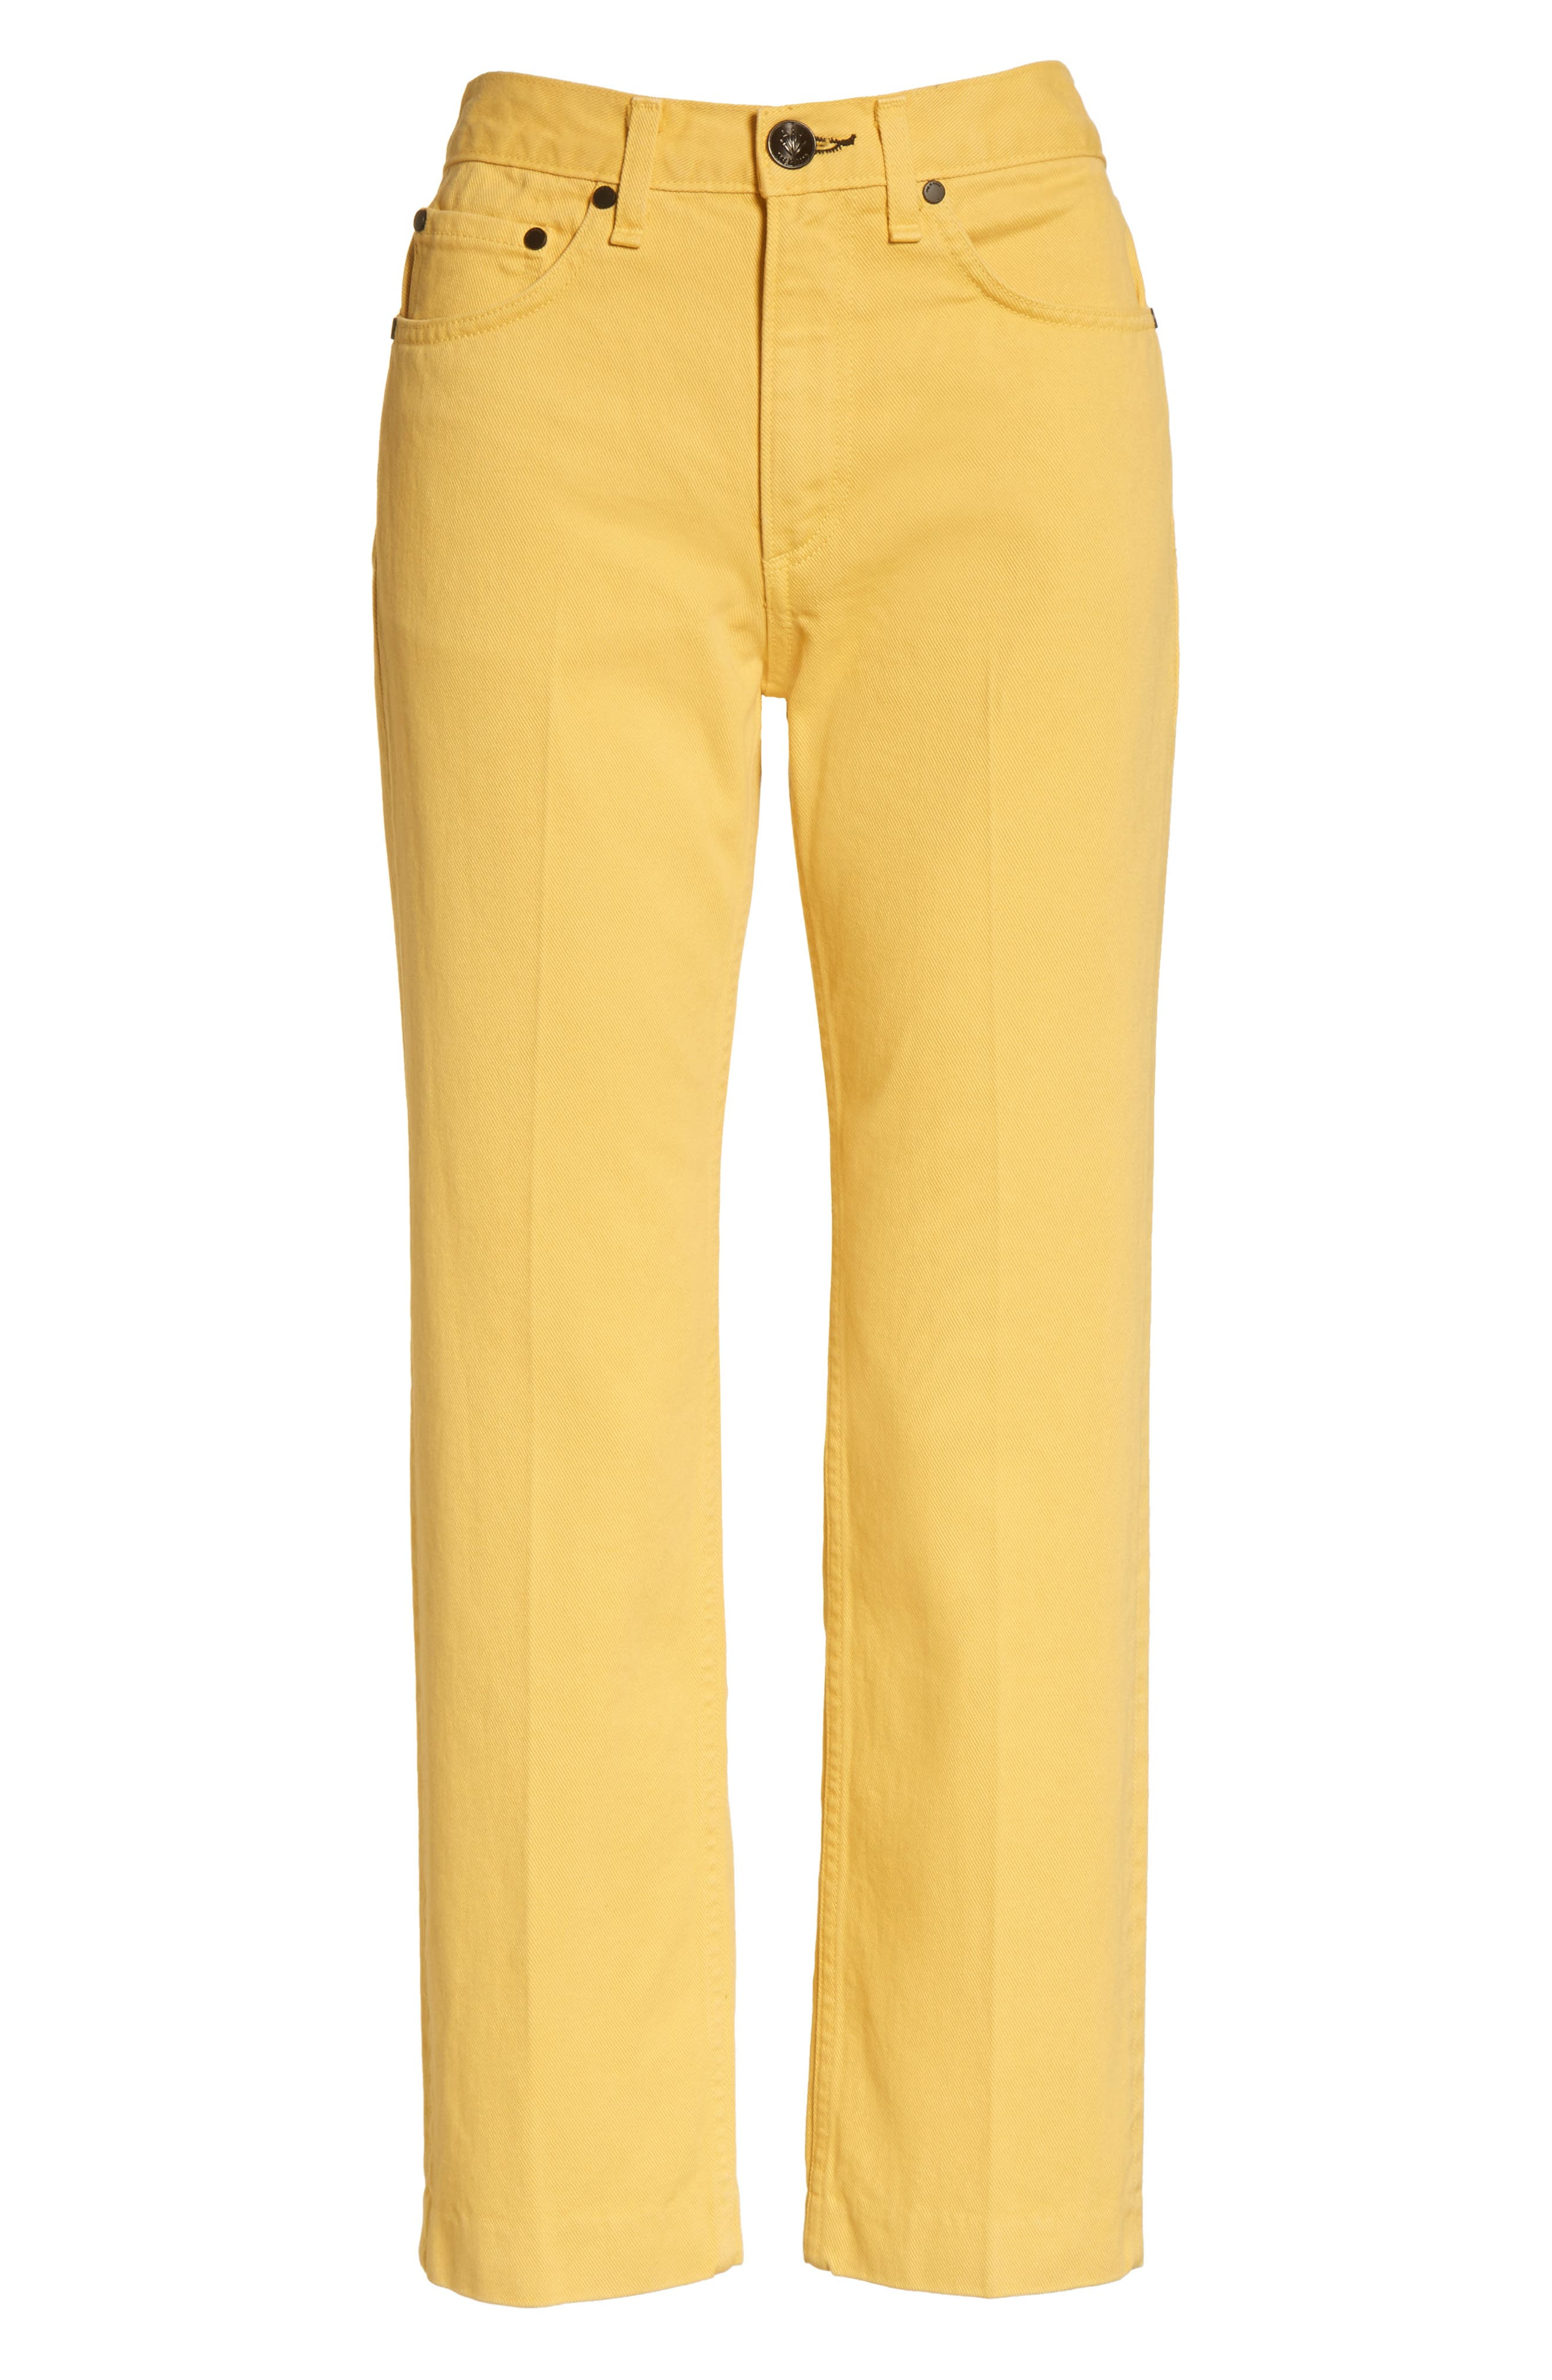 Straight Leg Crop Jeans,                             Alternate thumbnail 6, color,                             730